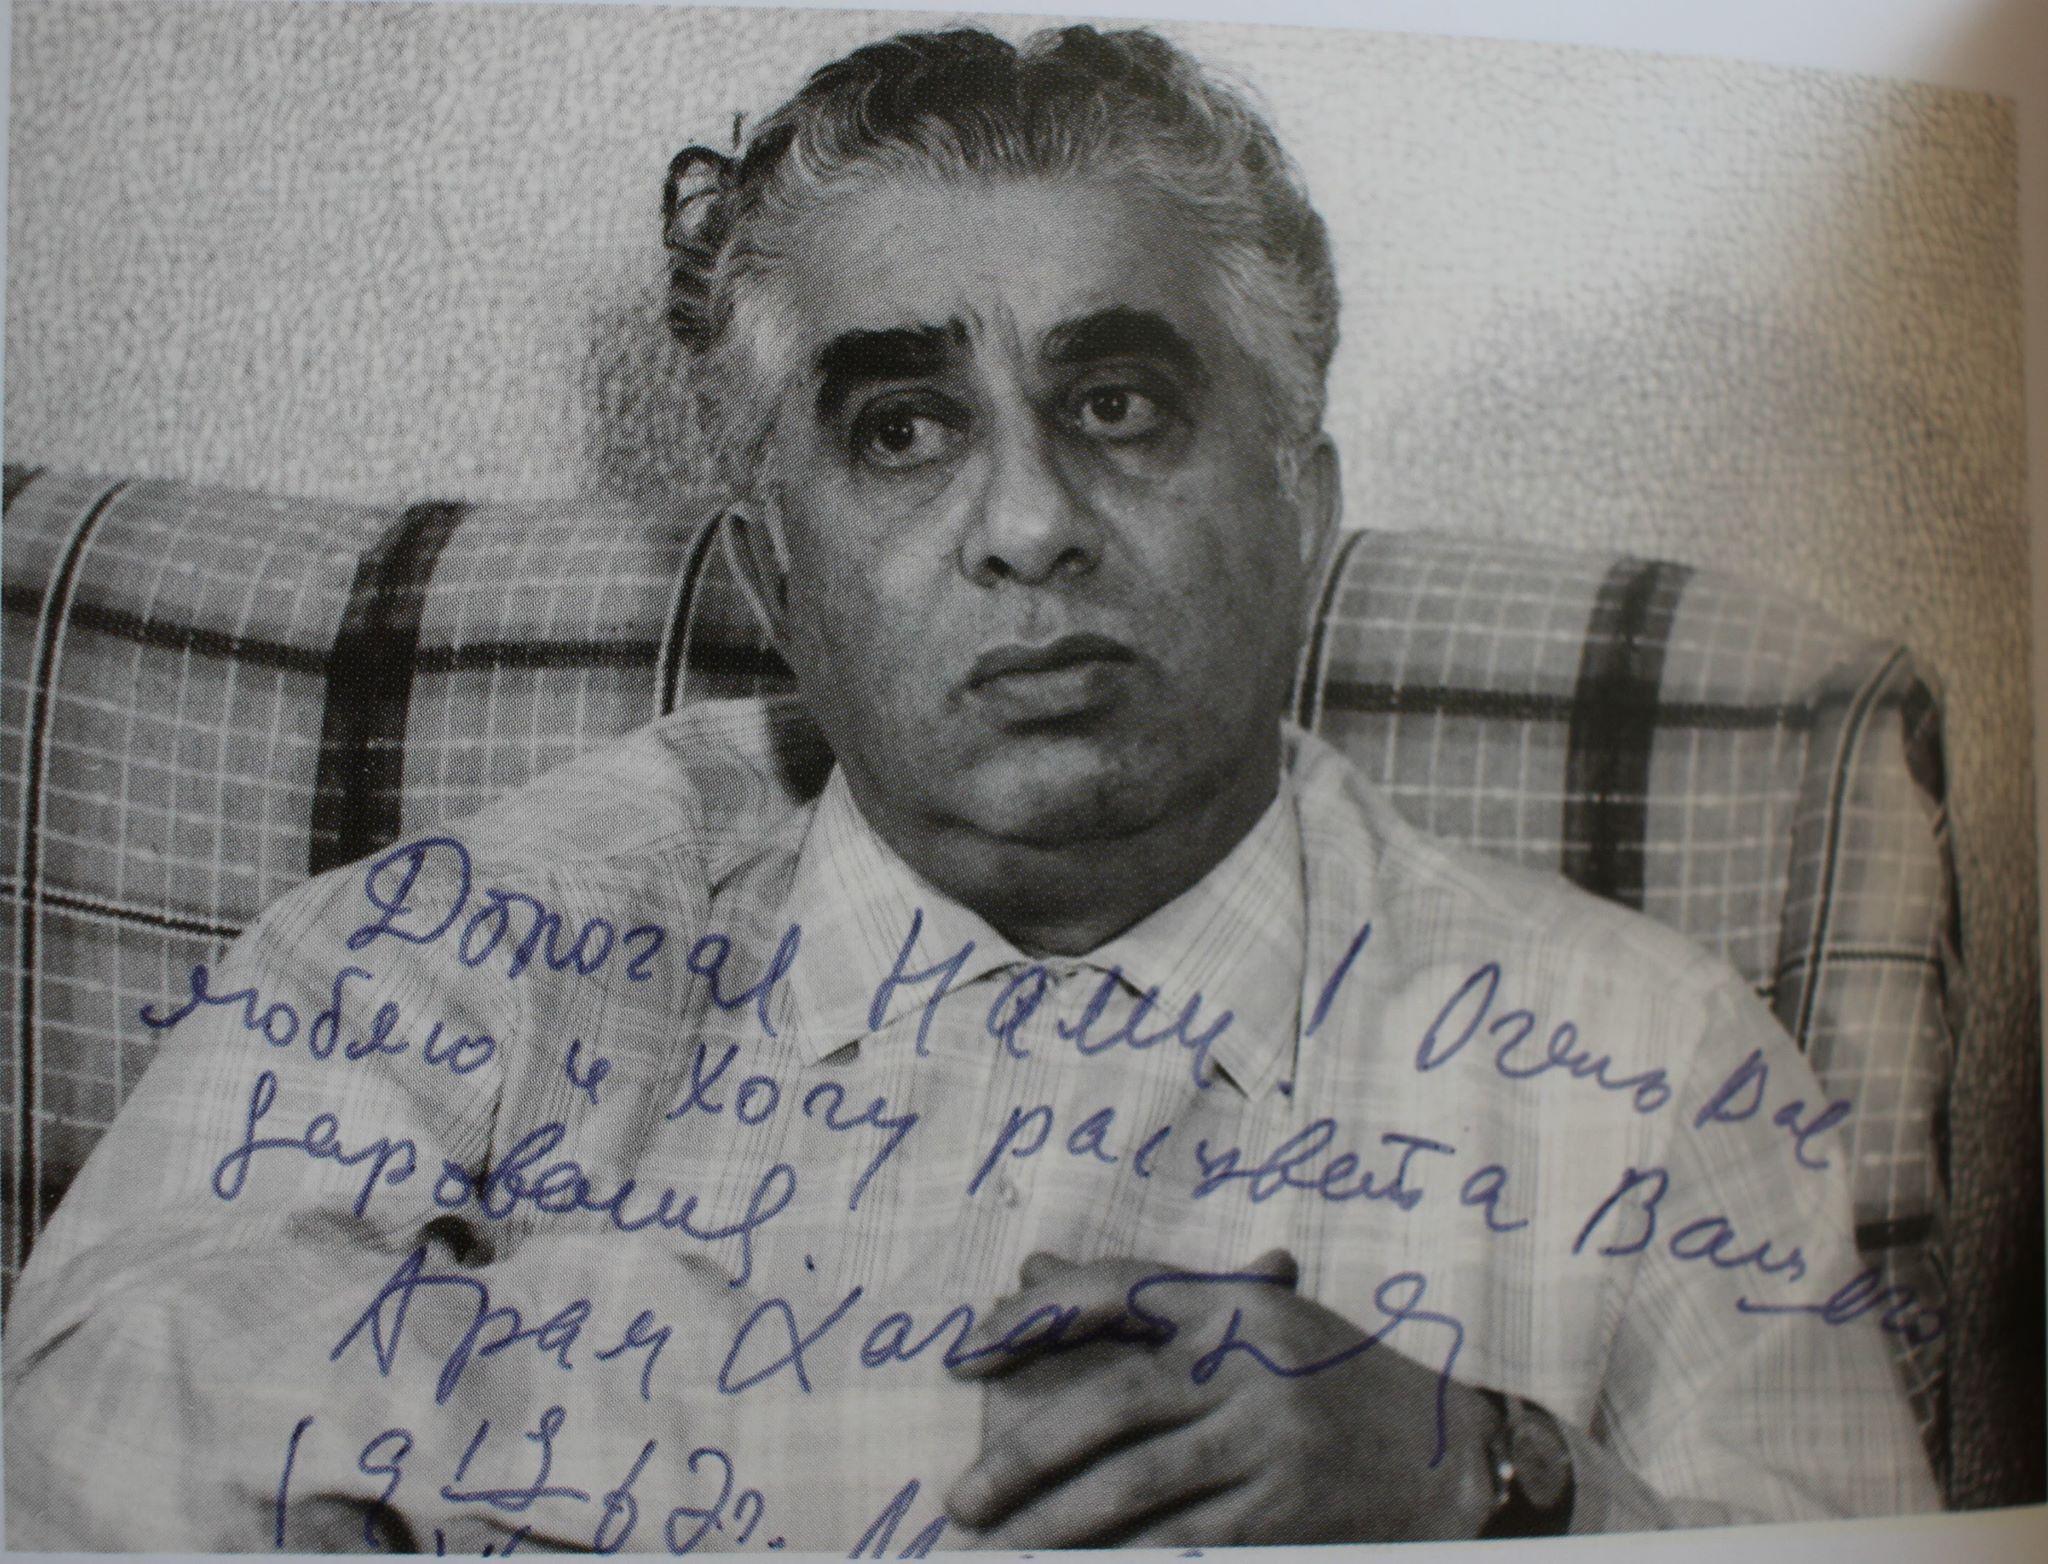 Арам Хачатурян, 1962 г.